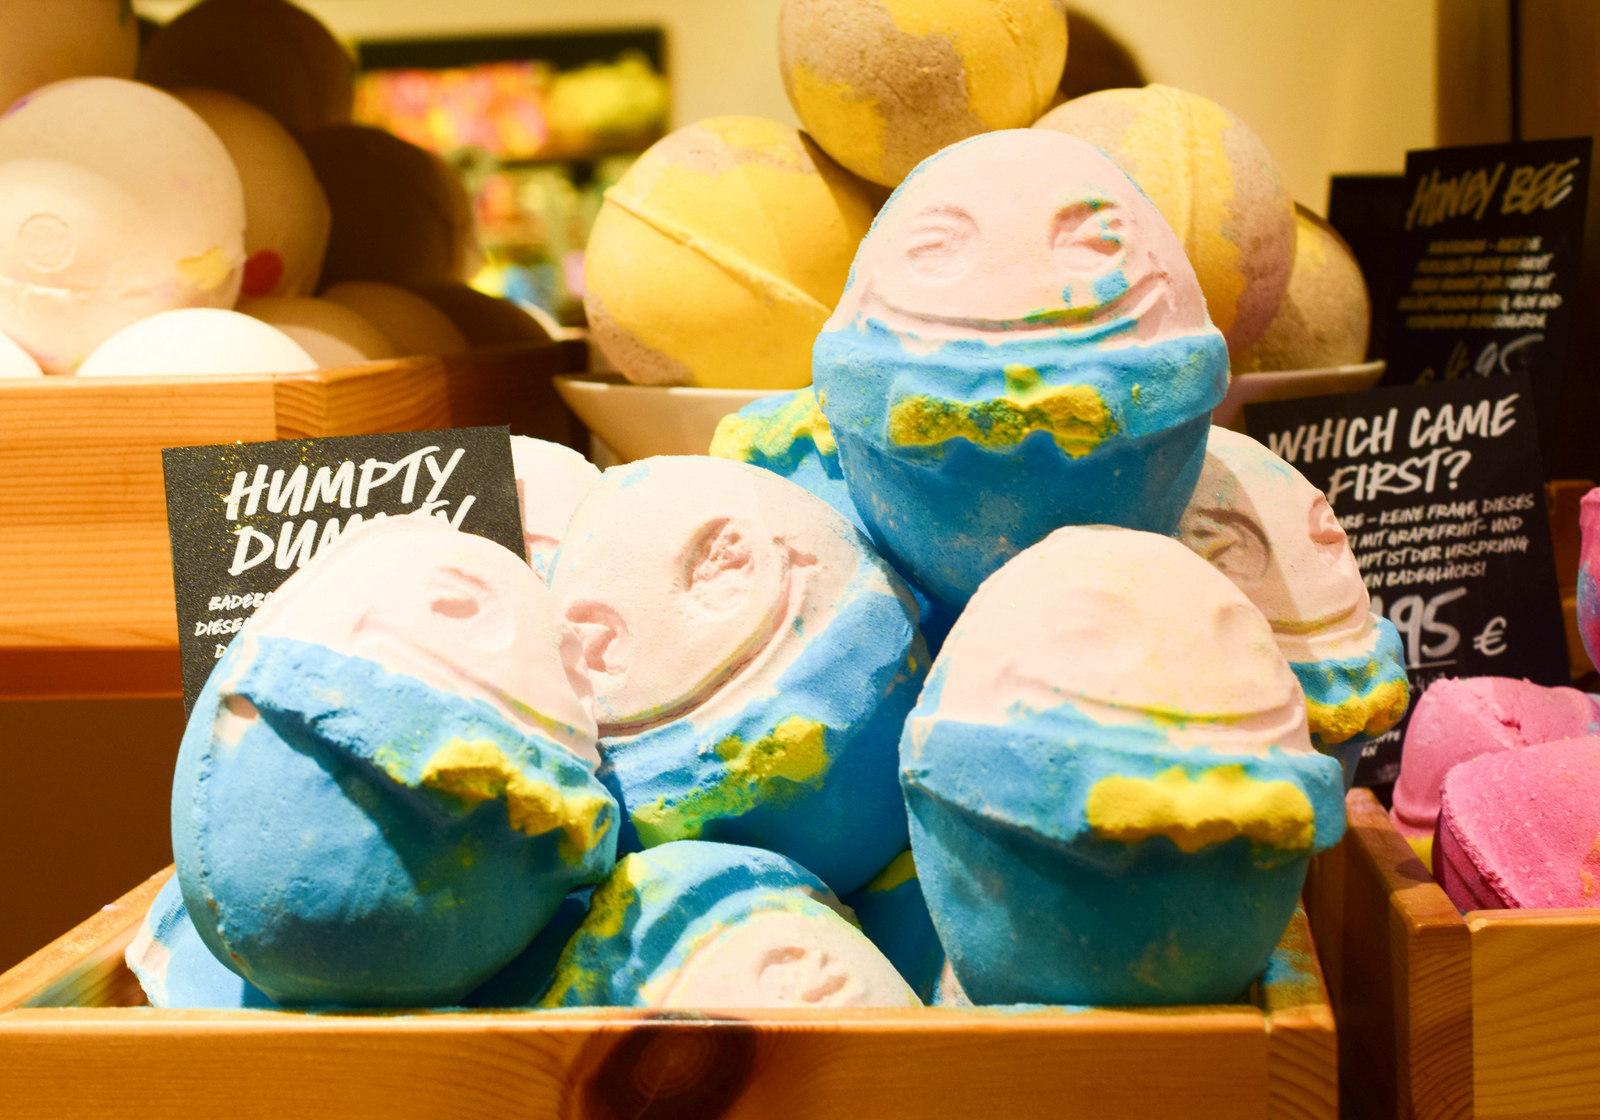 Lush Ostern 2016 Humpty Dumpty Badekugel